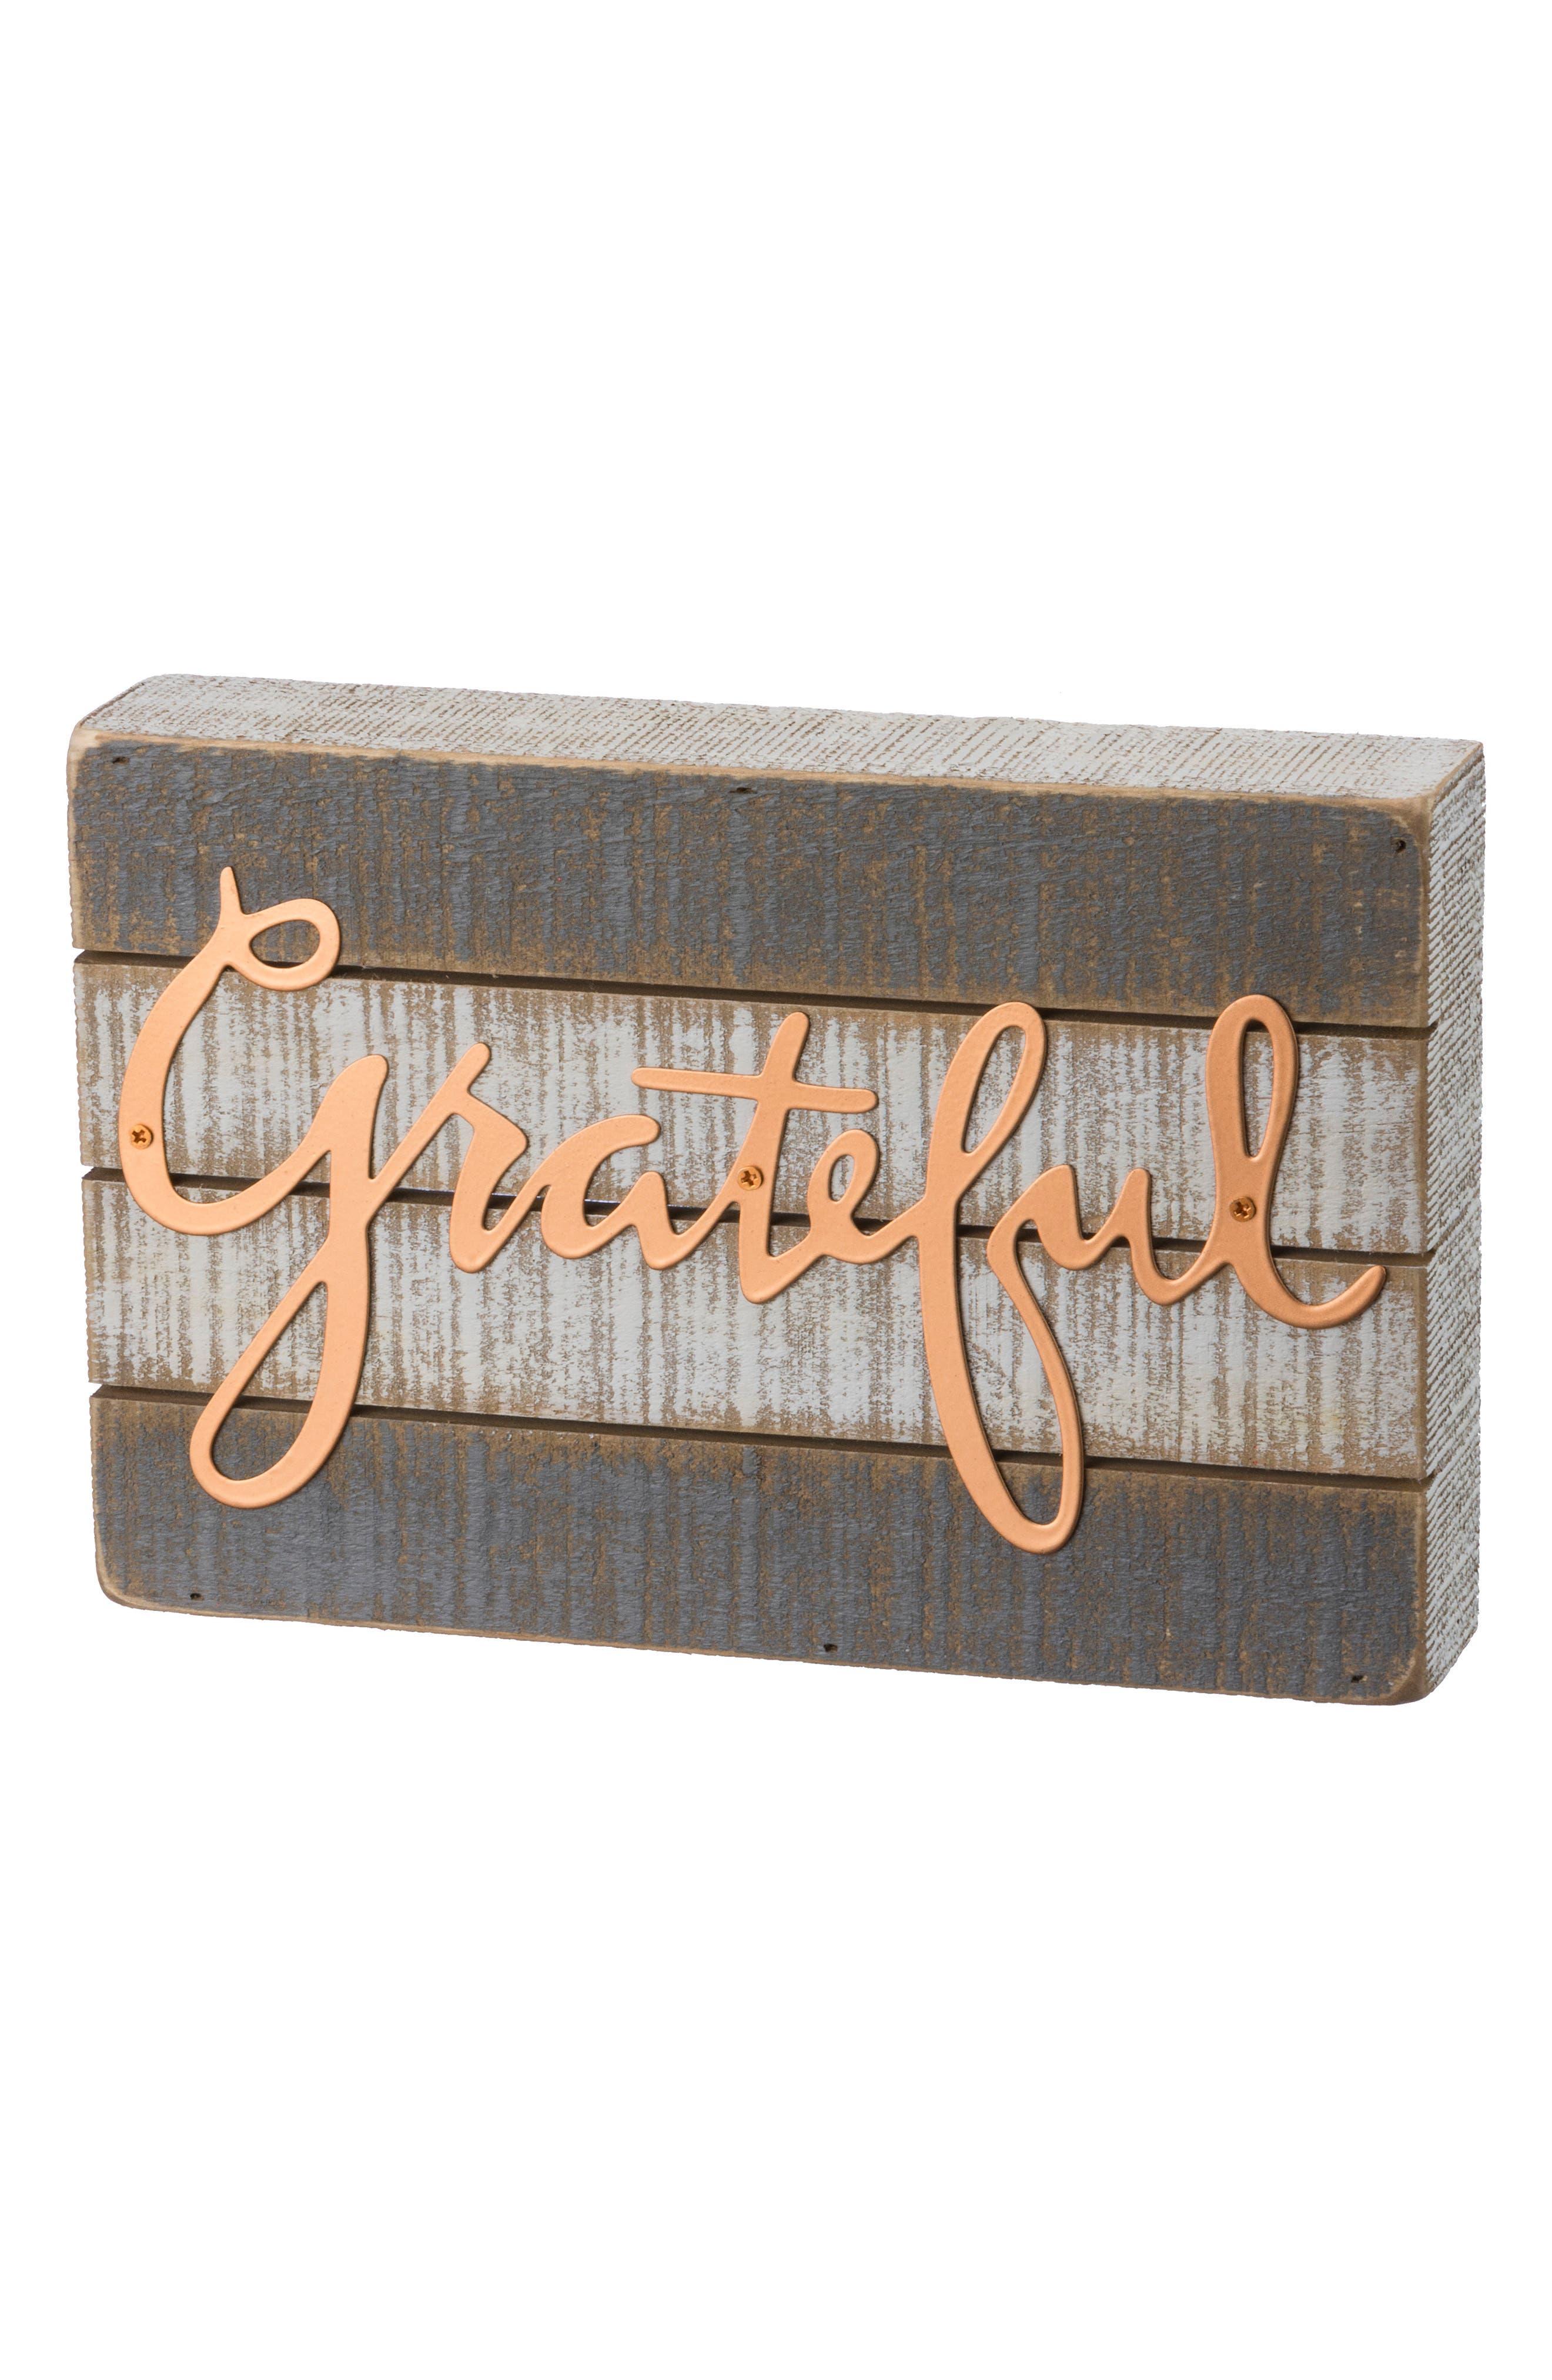 Primitives by Kathy Grateful Wood Box Sign